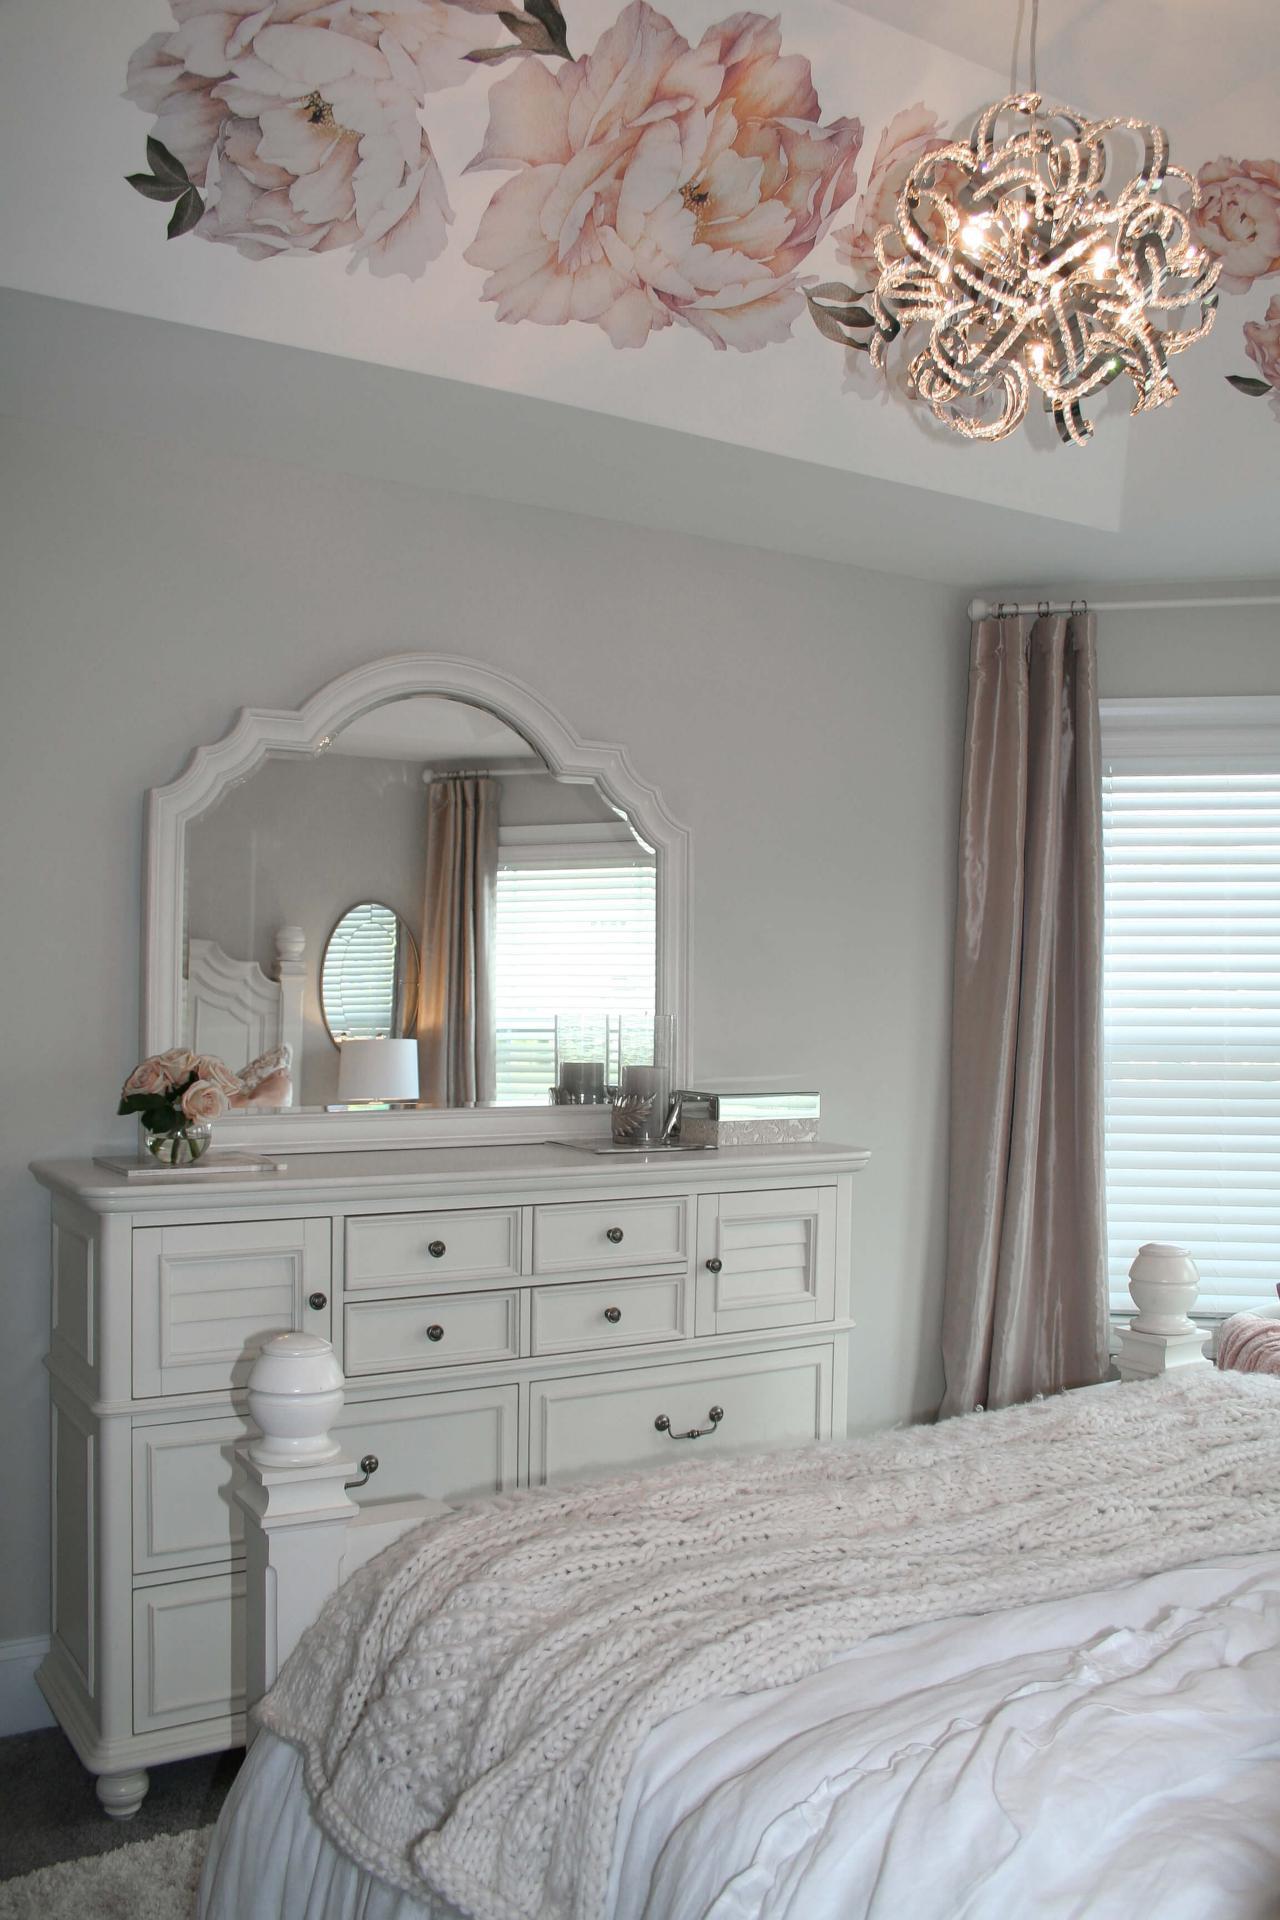 lovefordesigns style insider inspiration room makeover image 07